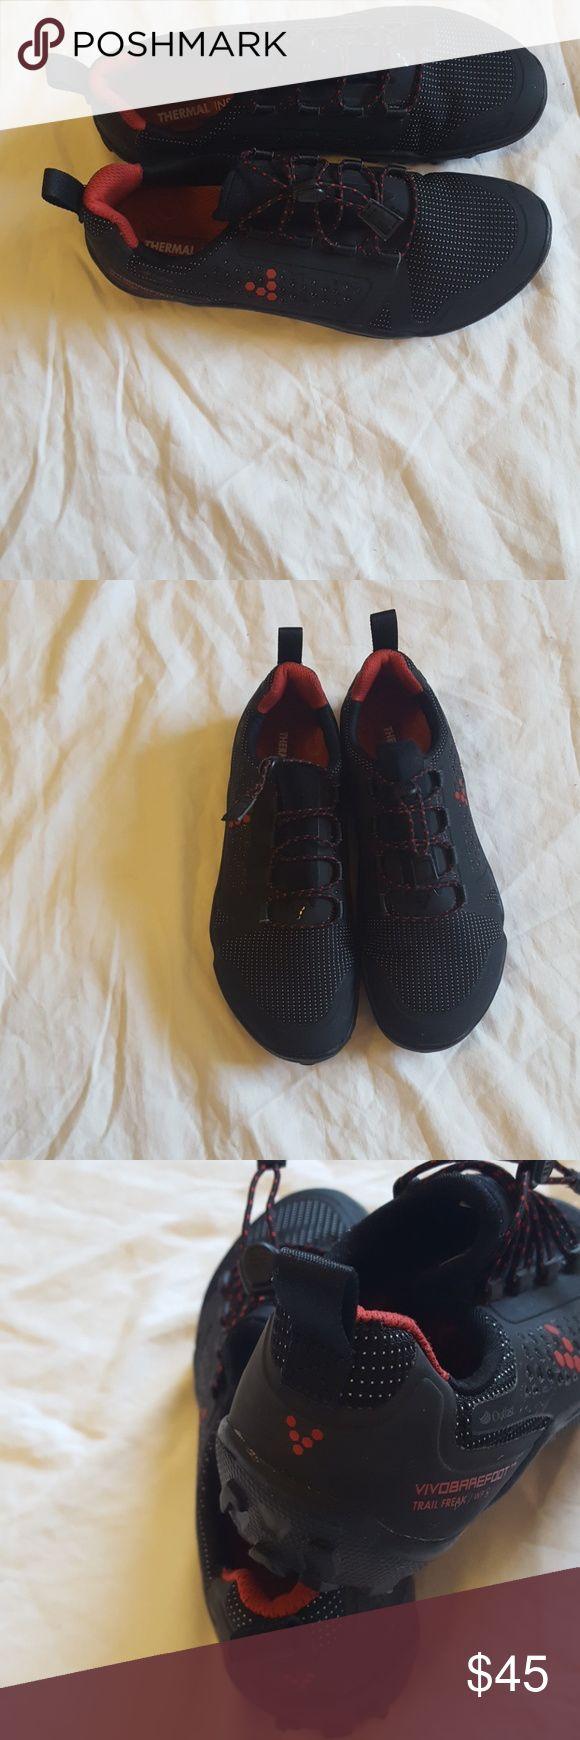 VIVOBRREFOOT TENIS SOHES  WOMEN  SIZE  37L EUR VIVOBRREFOOT TERMAL INSOLE IN LIKE NEW CONDITION Vivo barefoot Shoes